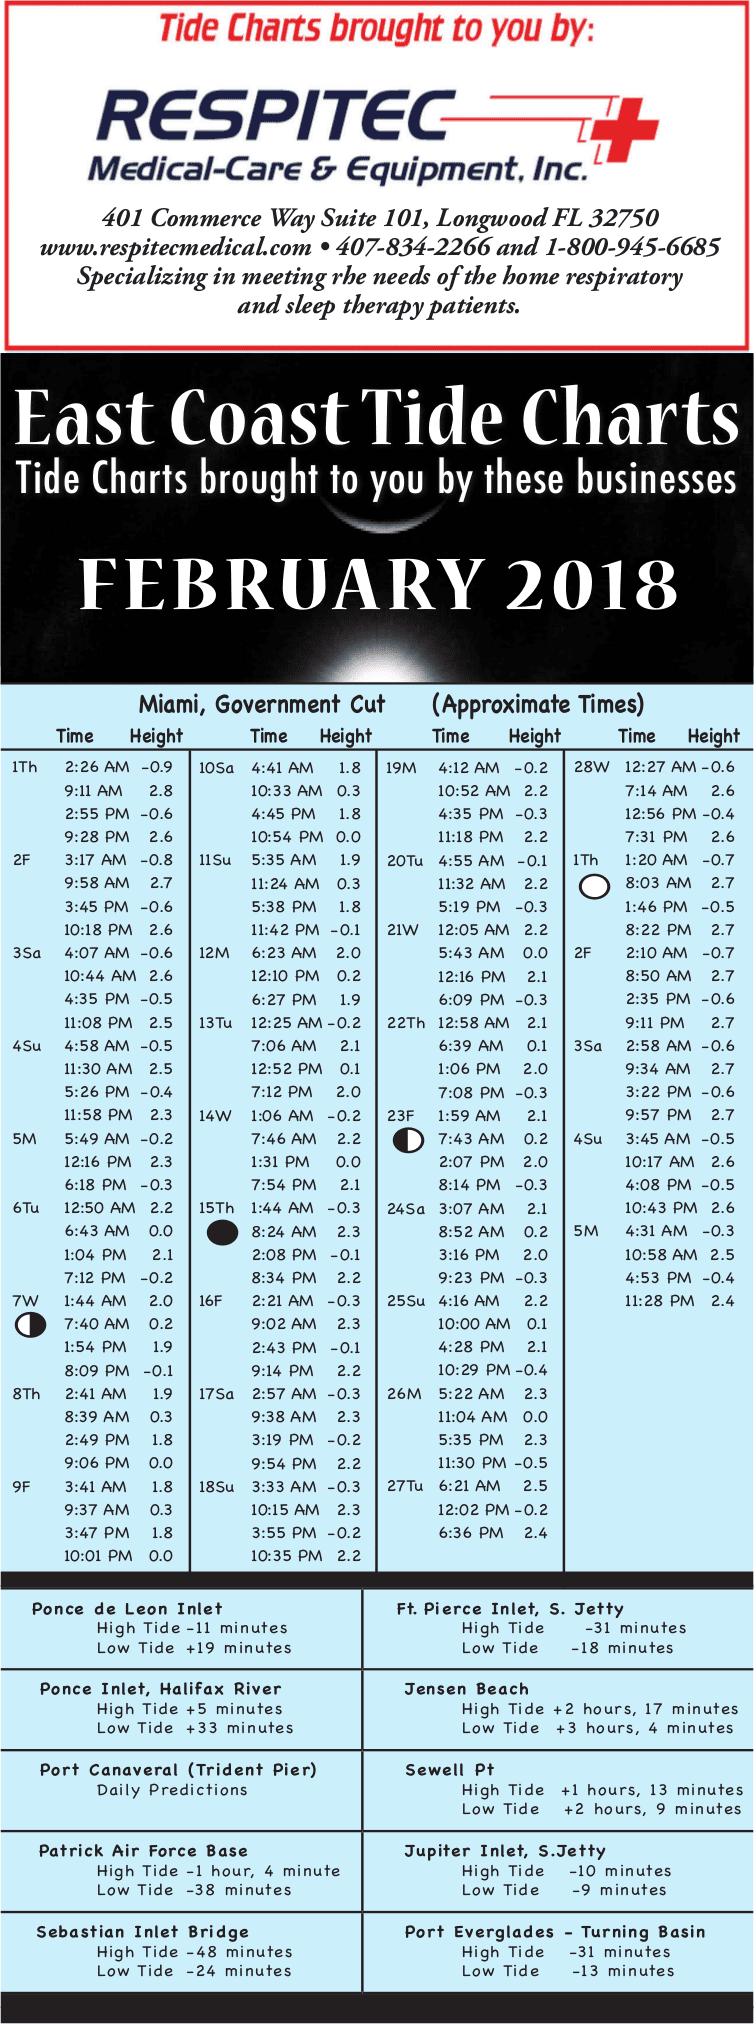 Nj tides chart choice image free any chart examples nj tides chart choice image free any chart examples sandy hook nj tide chart gallery free nvjuhfo Images